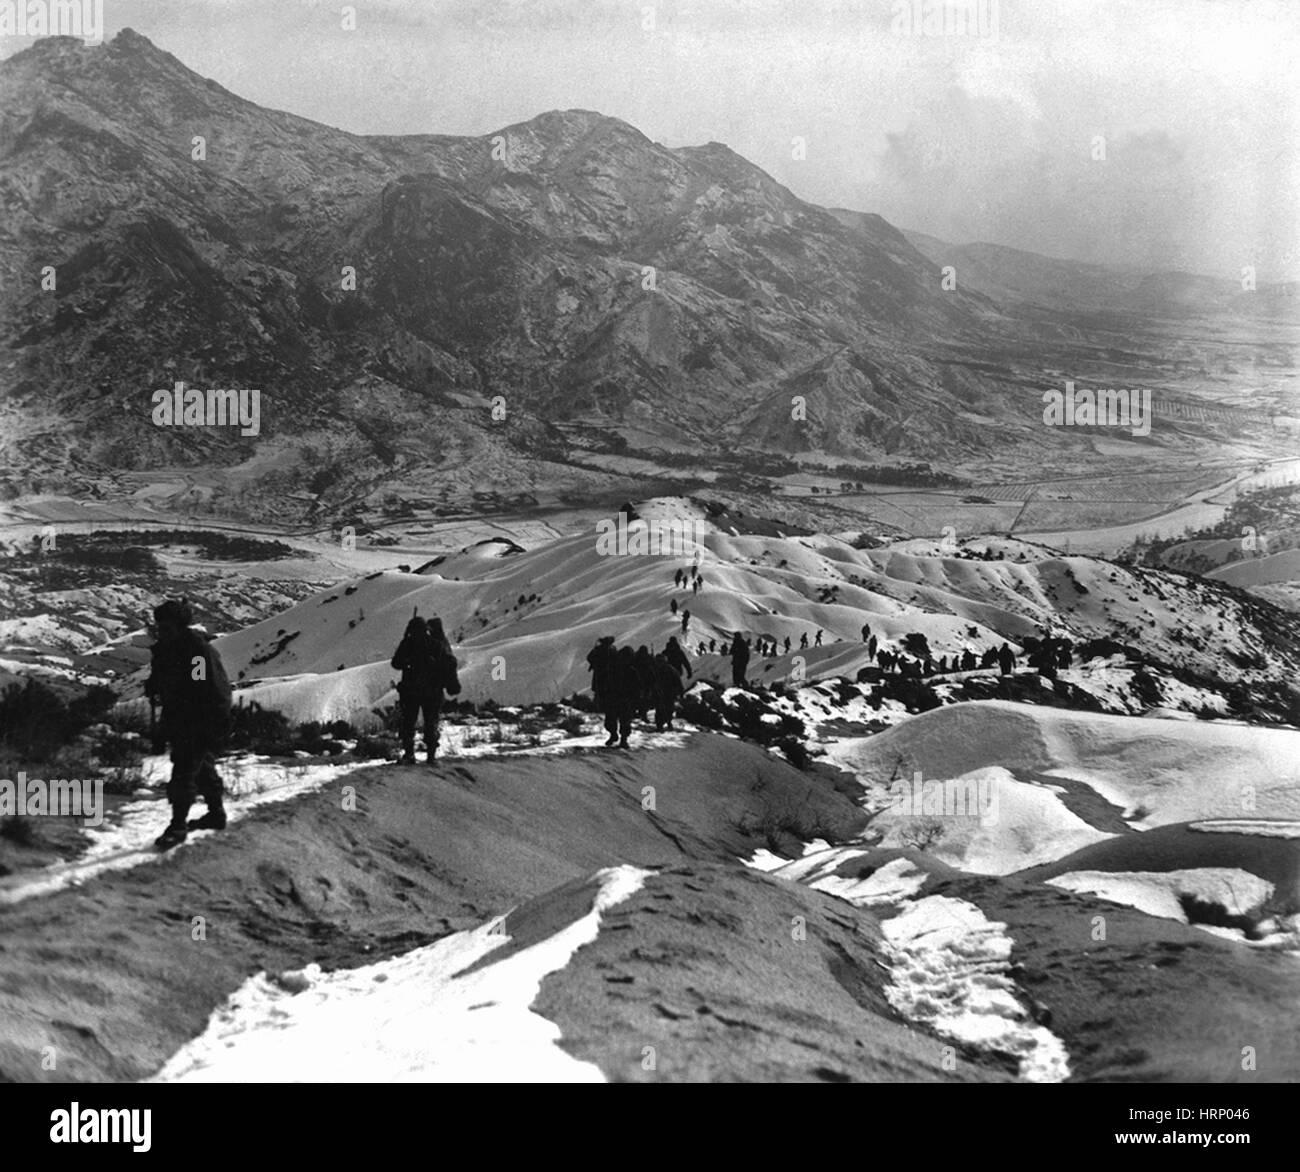 Korean War, Enemy Reconnaissance, 1951 - Stock Image